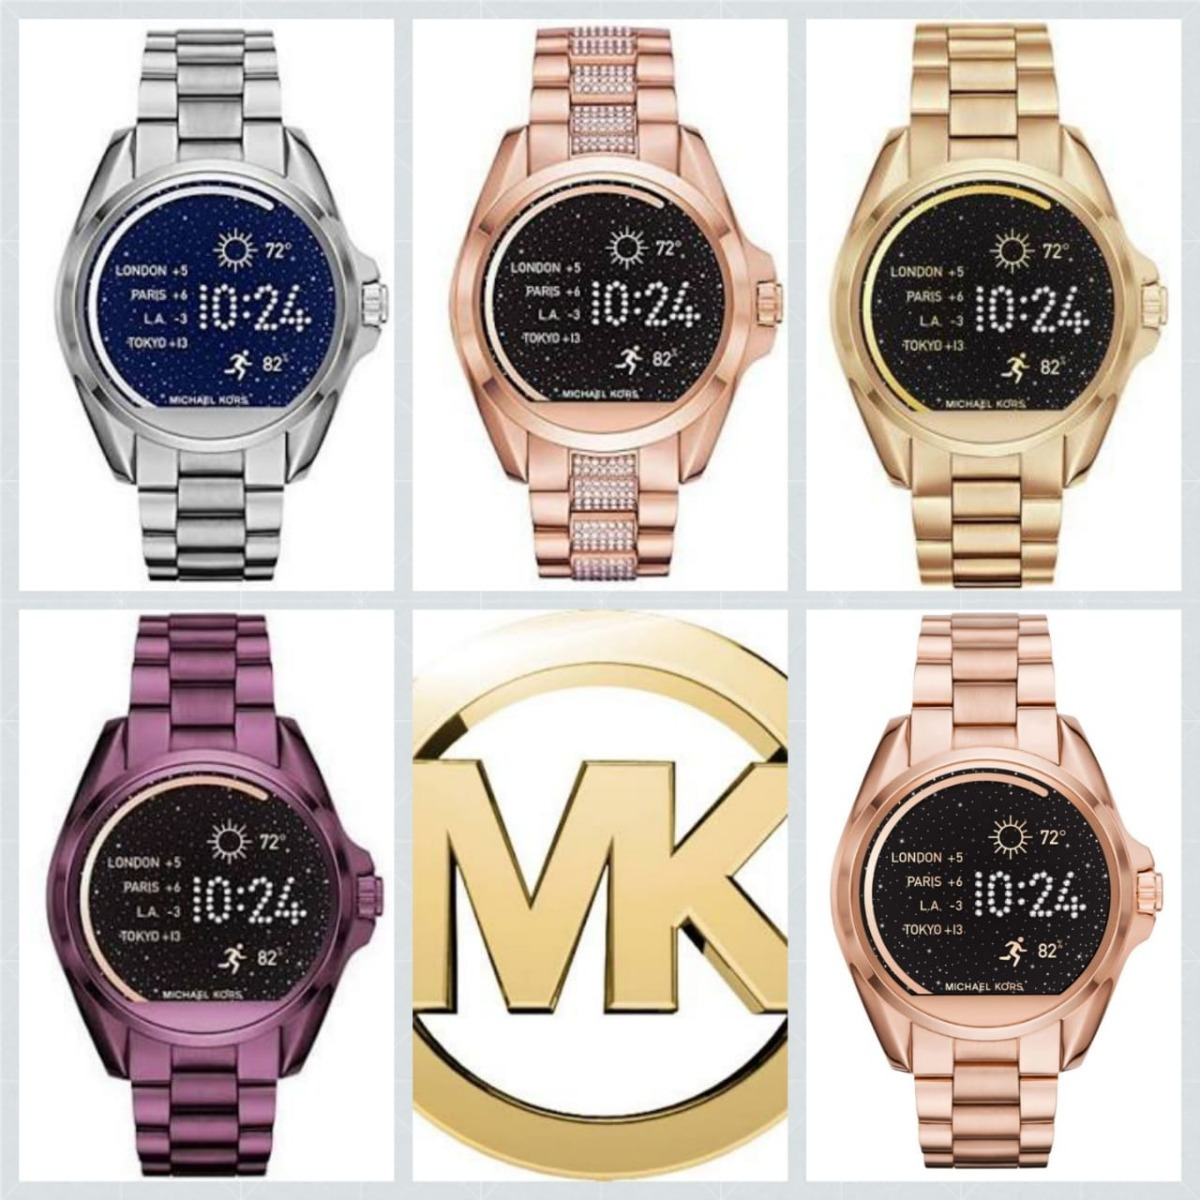 794b7c641ba5 reloj michael kors access smart watch mk original. Cargando zoom.